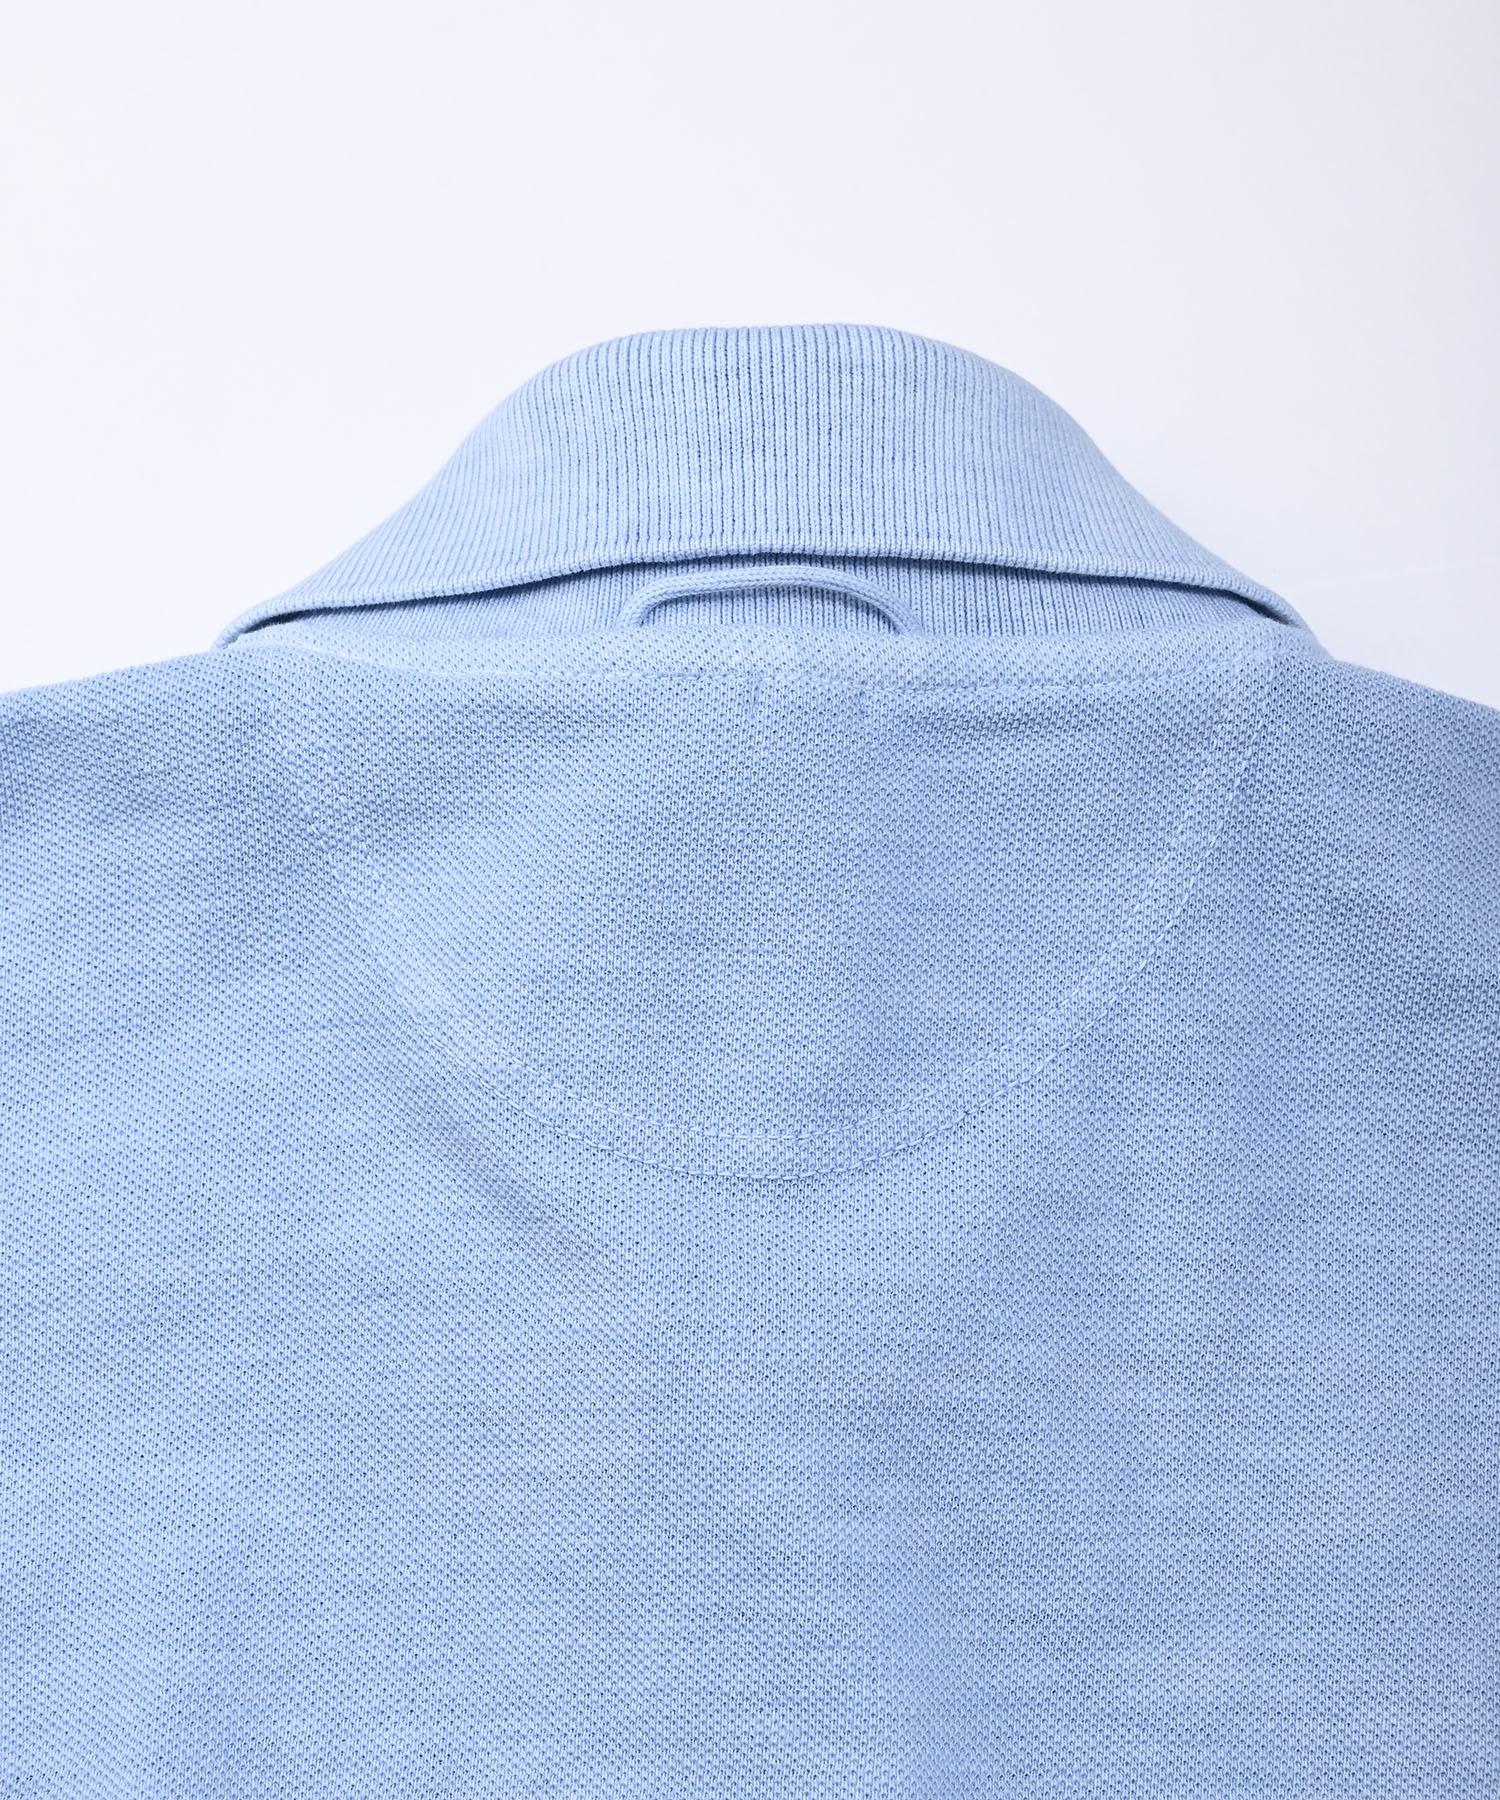 Kanoko Ocean Shiokaze Long-sleeved Polo Shirt (0421)-11